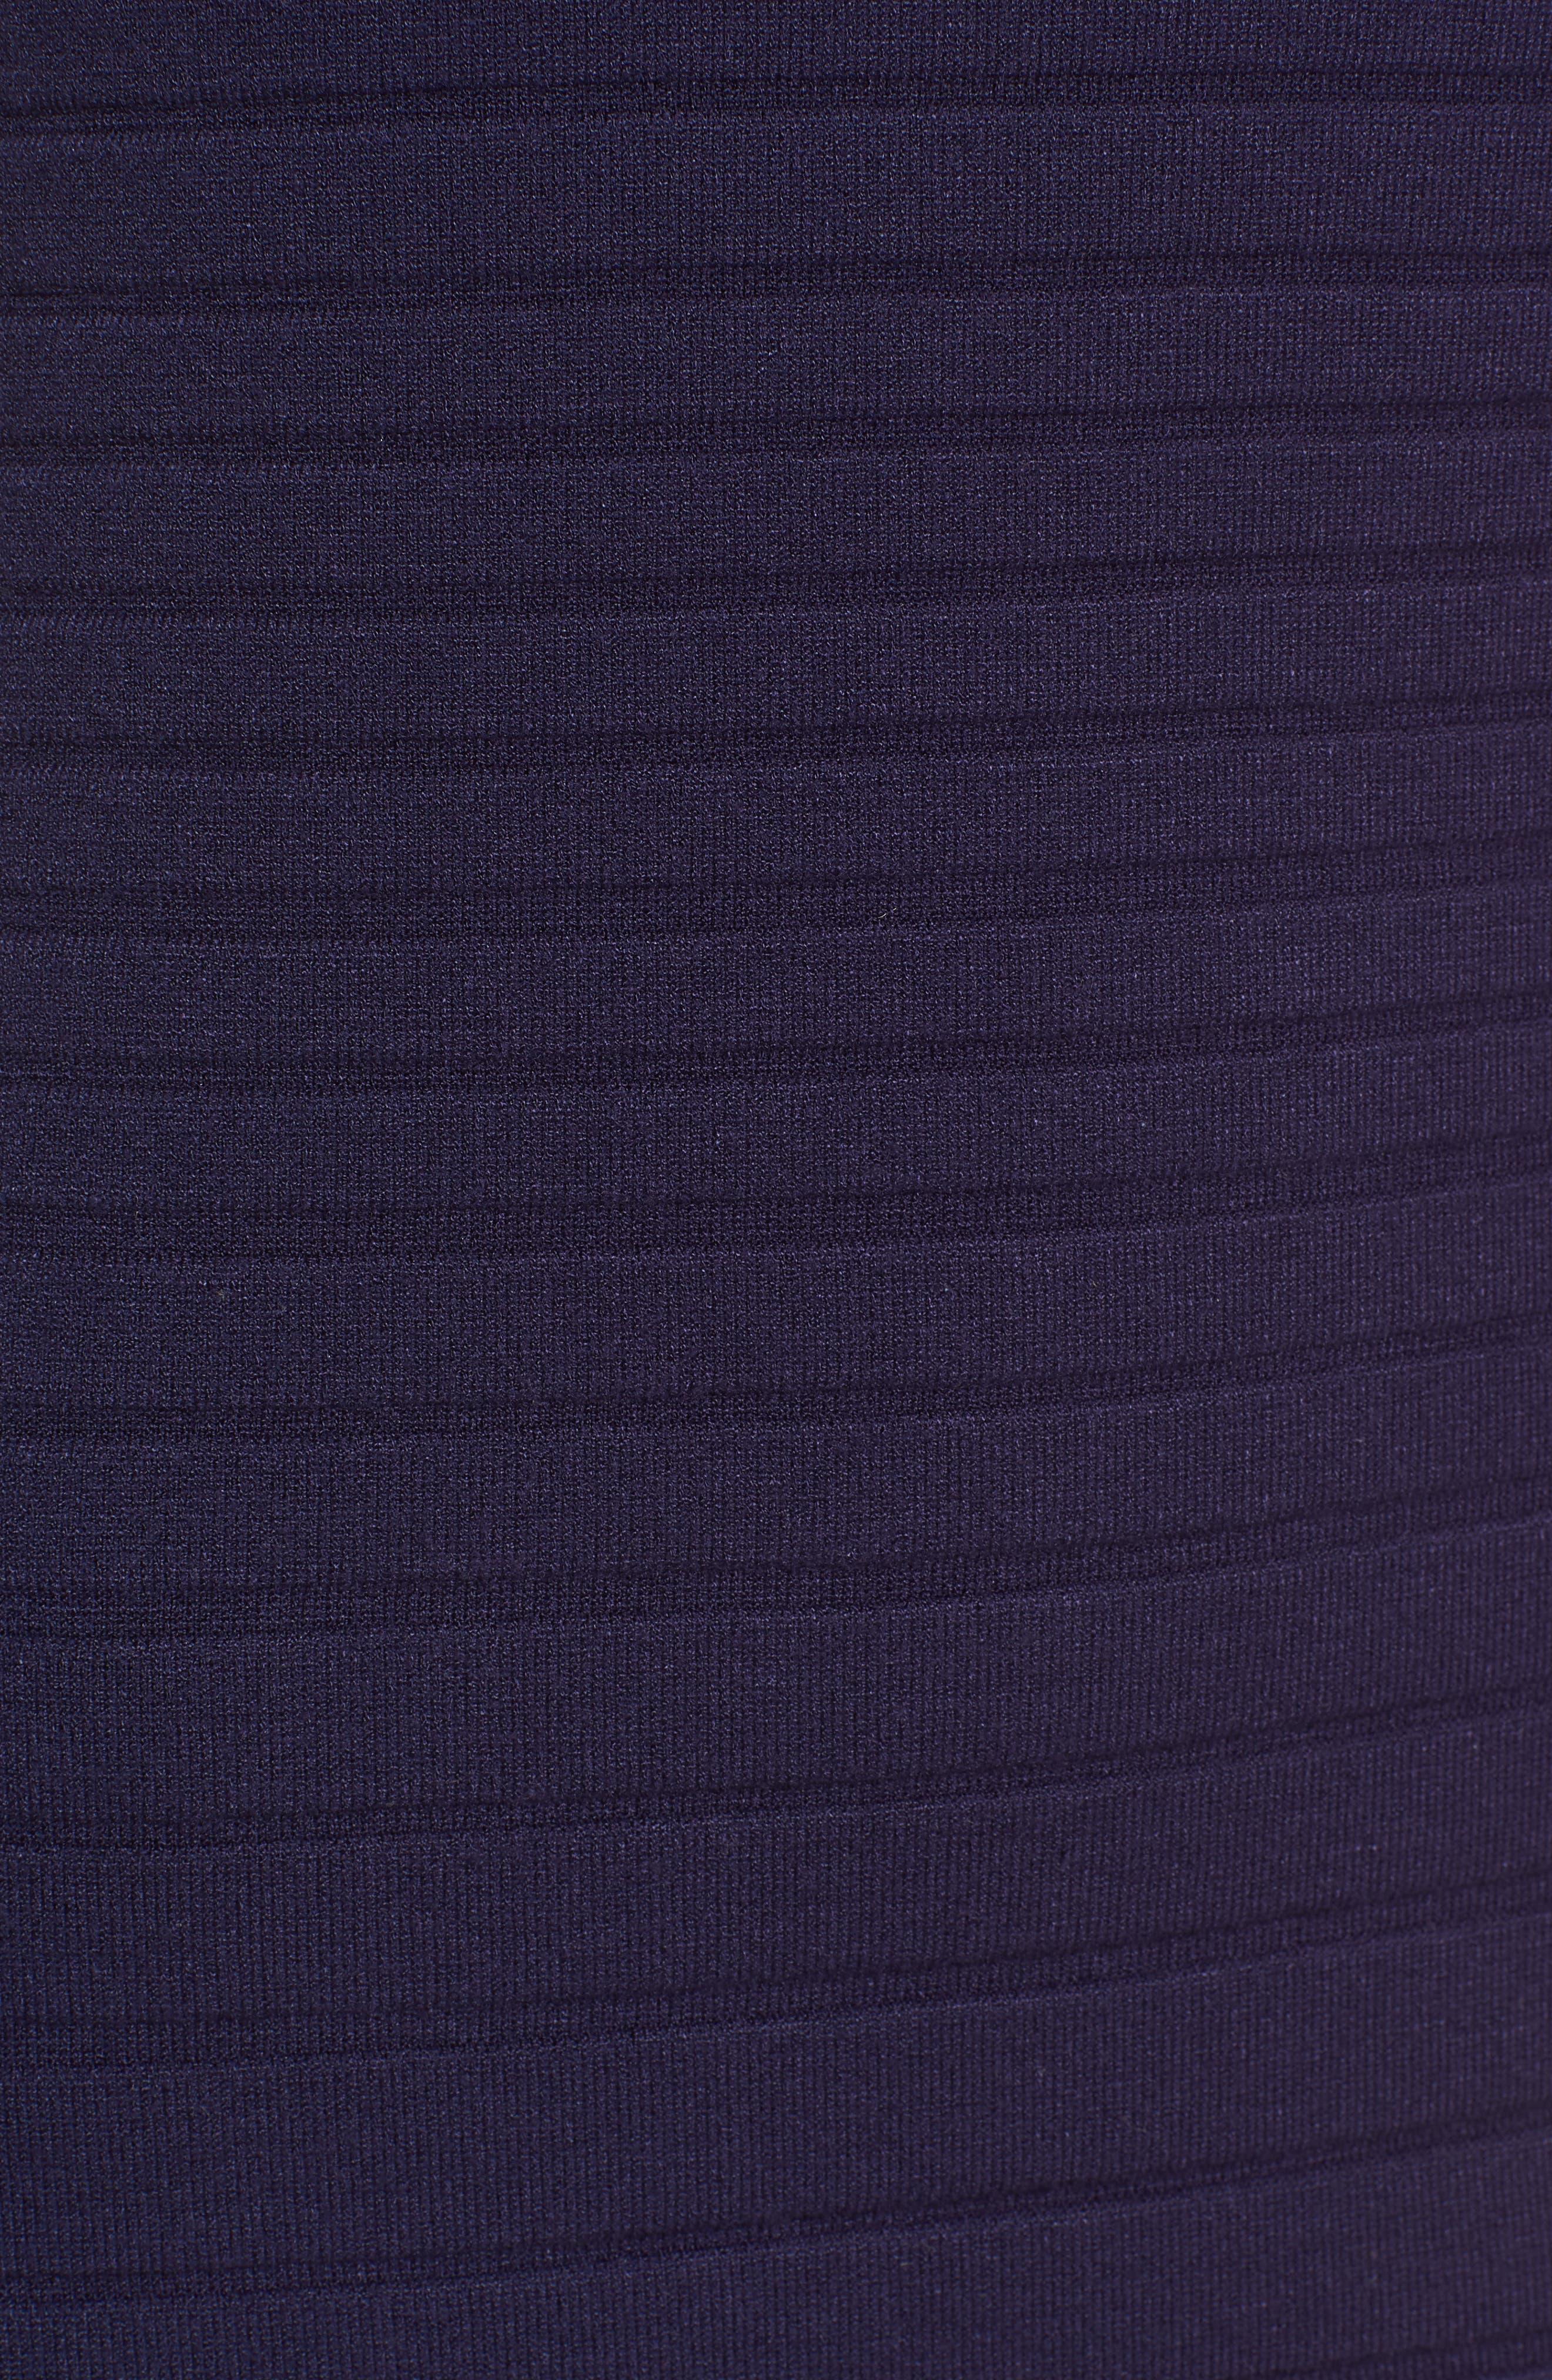 Textured Stripe Knit Dress,                             Alternate thumbnail 5, color,                             Monaco